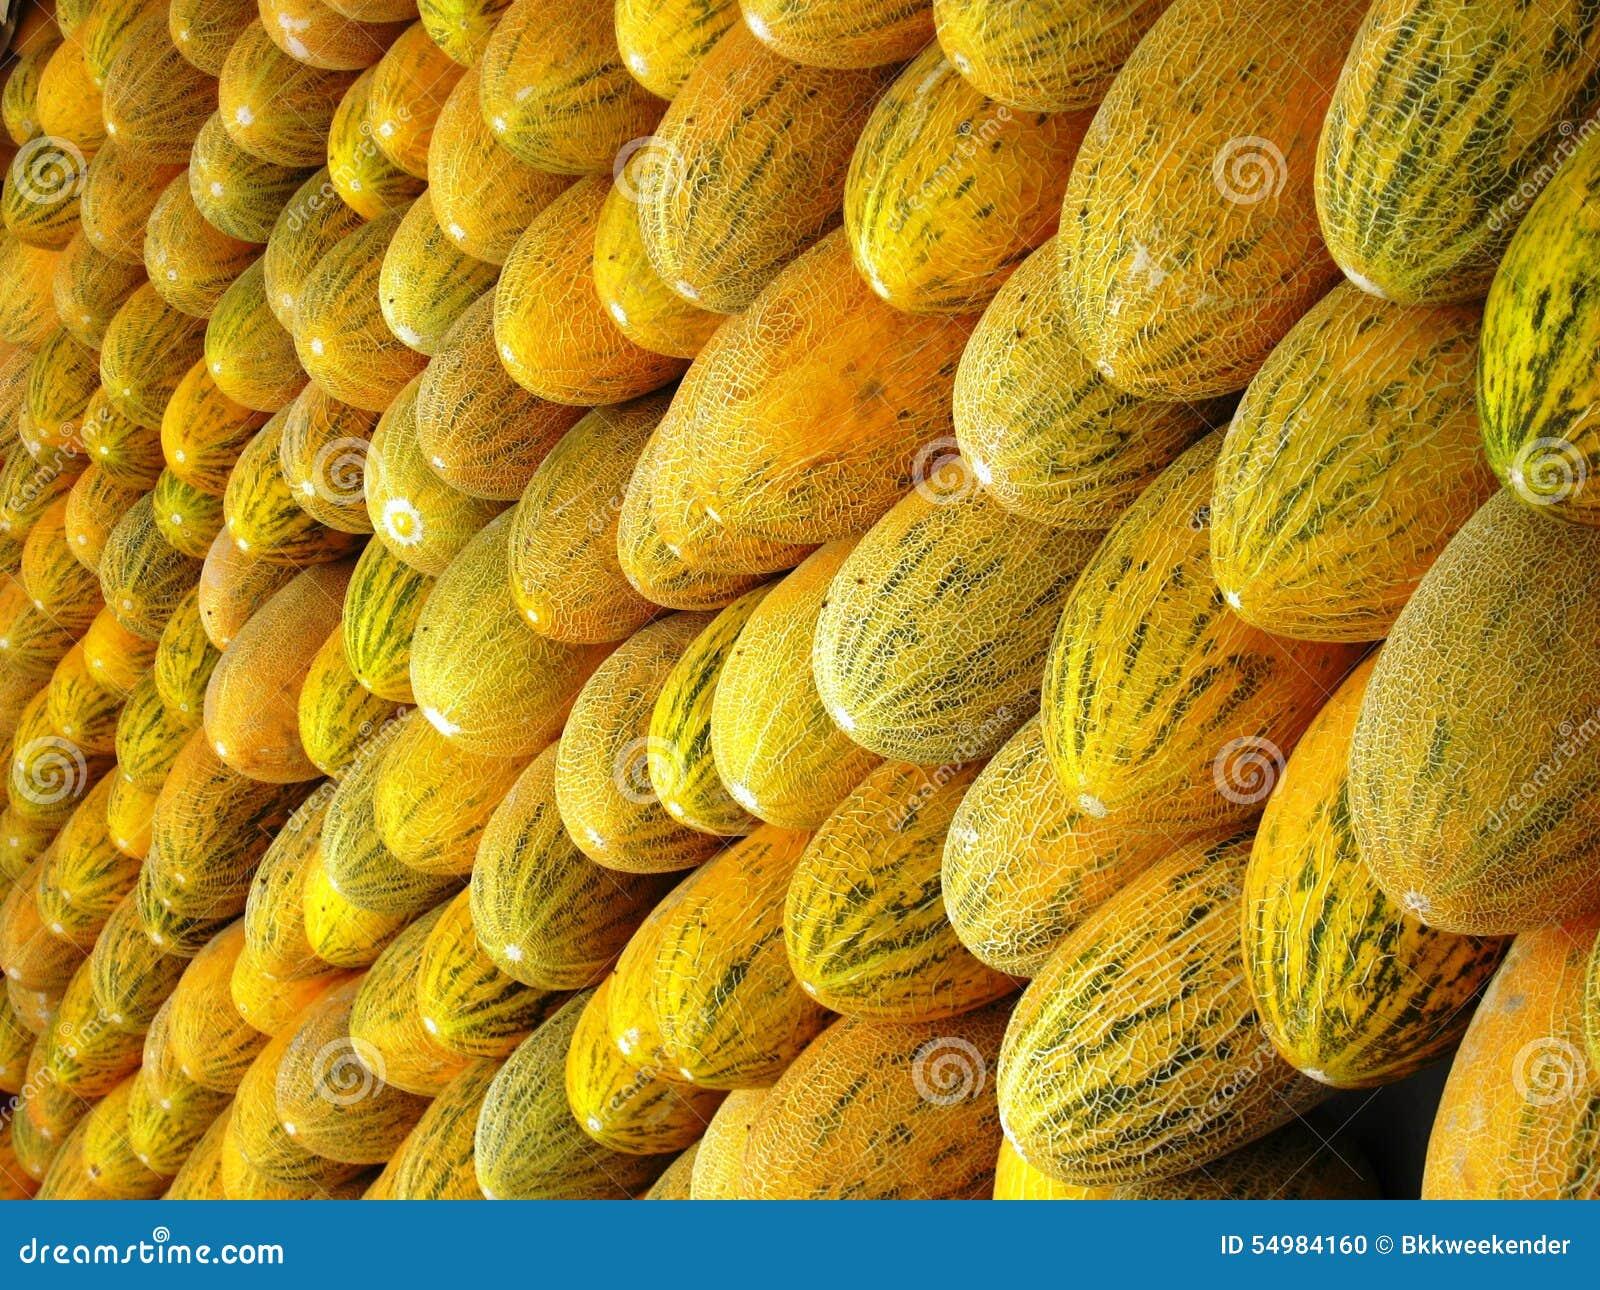 Kinesisk melon